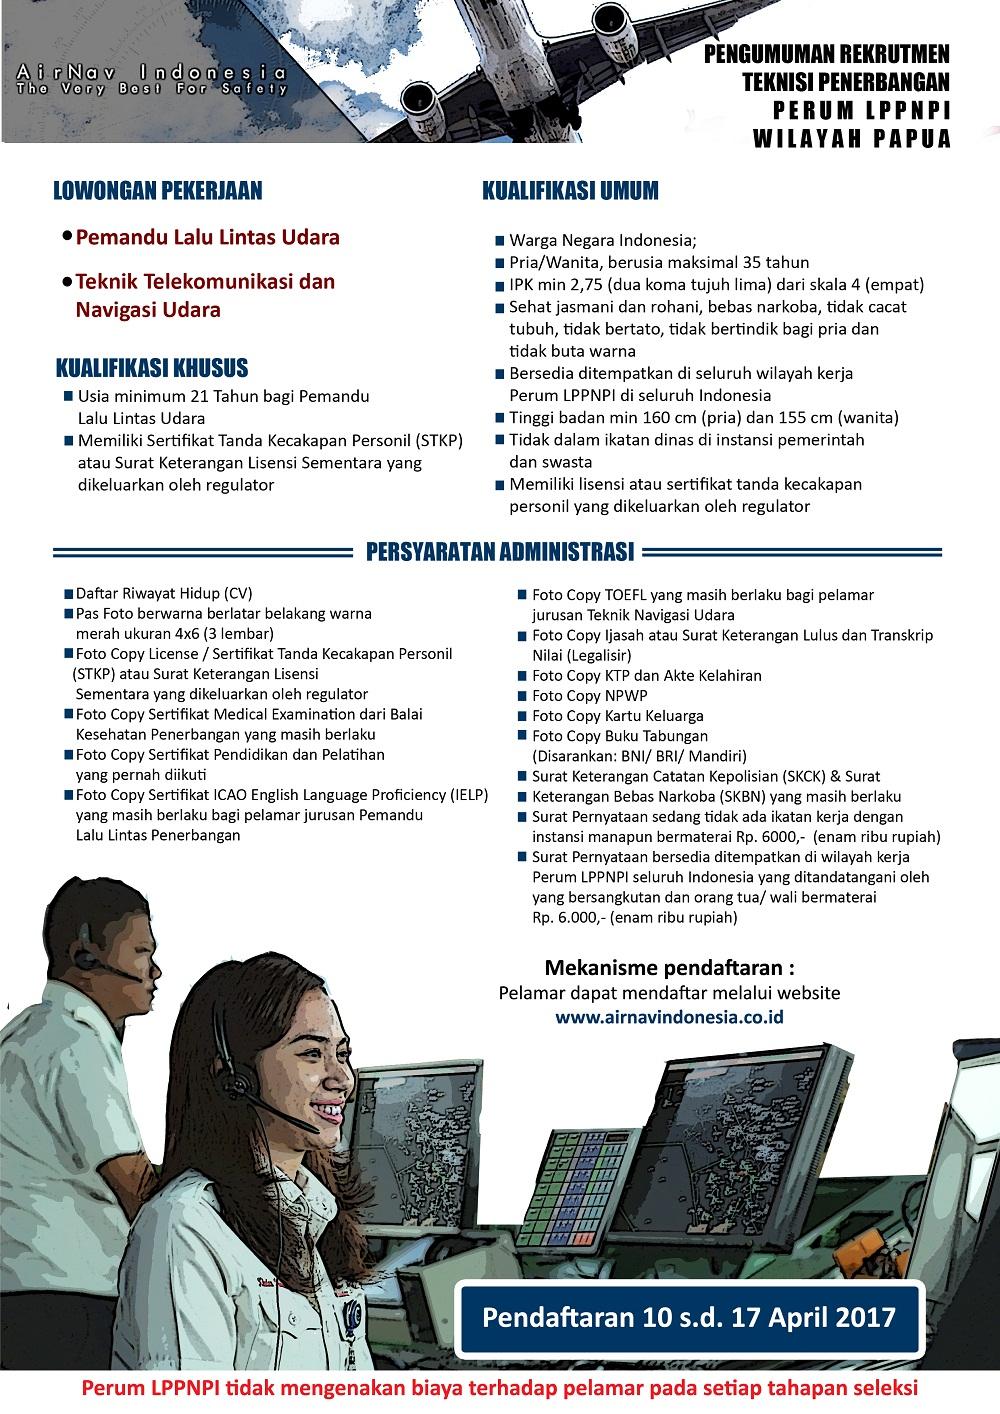 Rekrutmen Fungsi Teknisi Penerbangan Perum LPPNPI 2017 Wilayah Papua